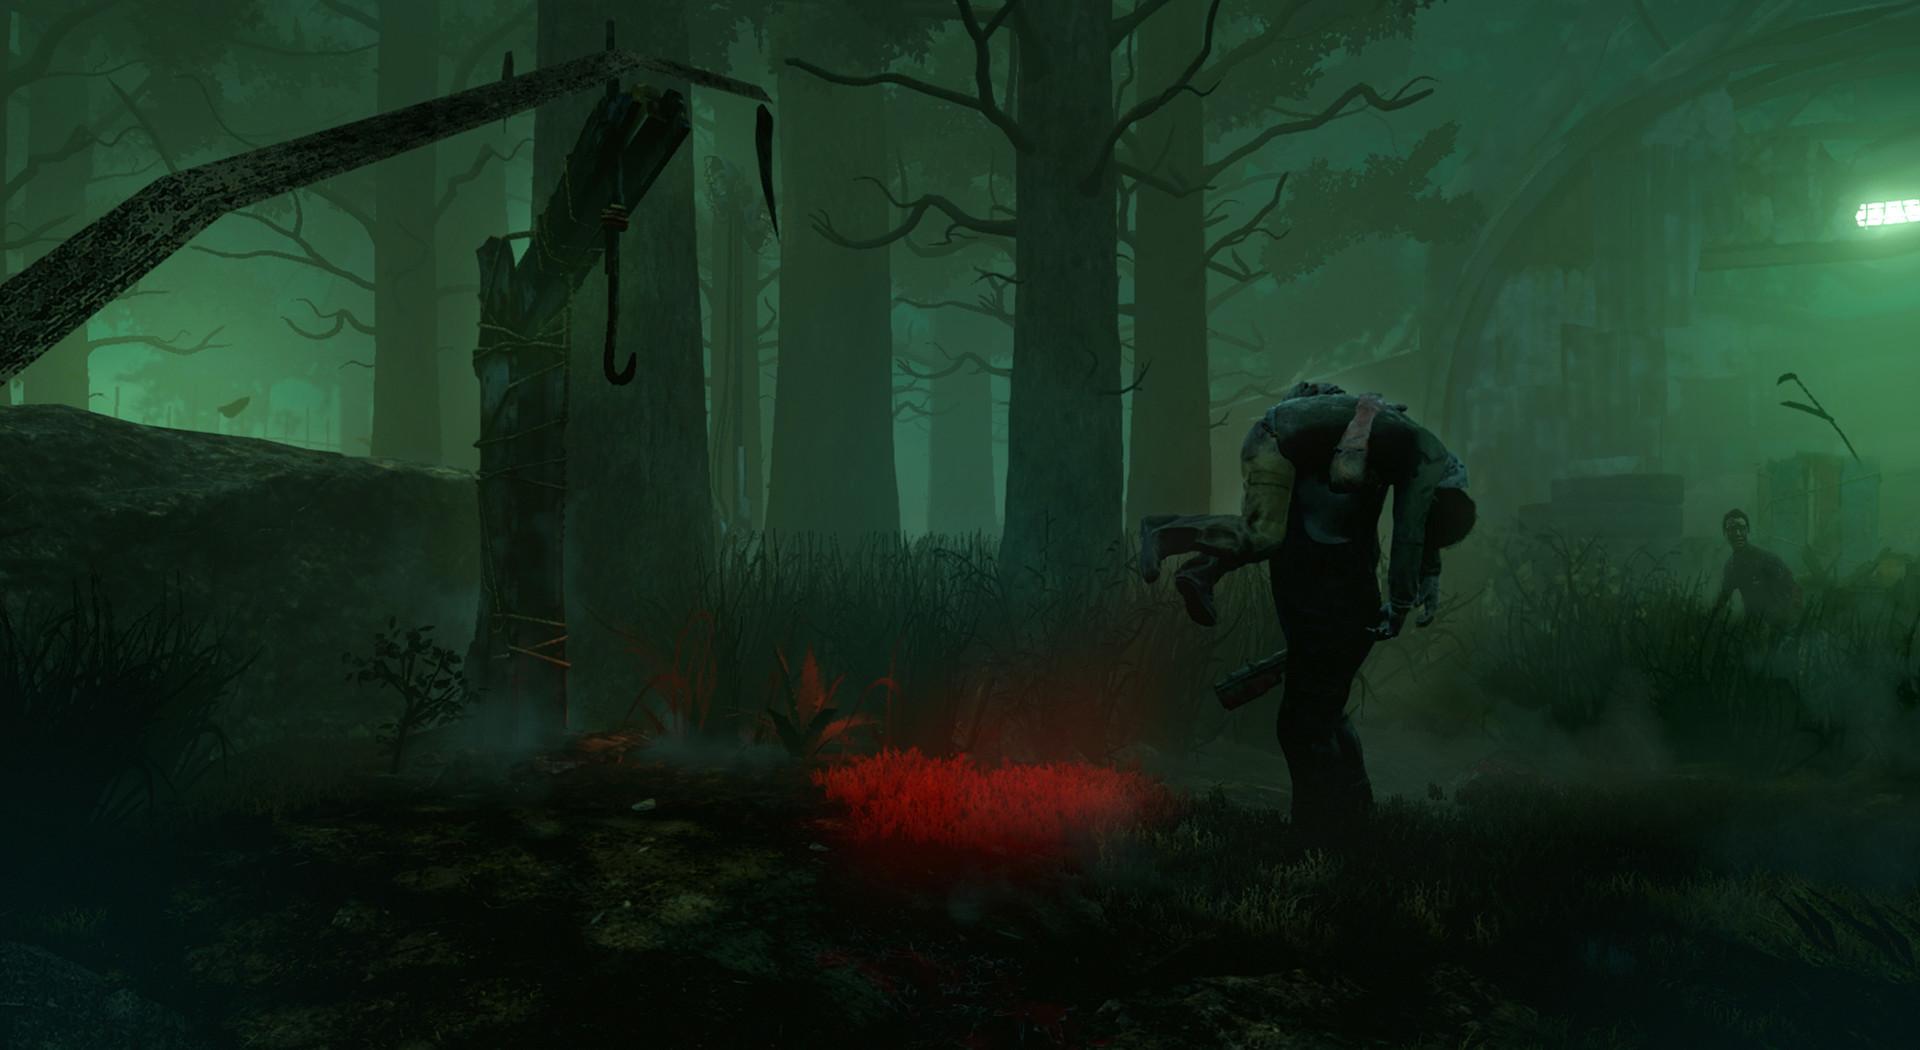 Скриншоты к Dead by Daylight v1.9.1 на русском (по сети онлайн)